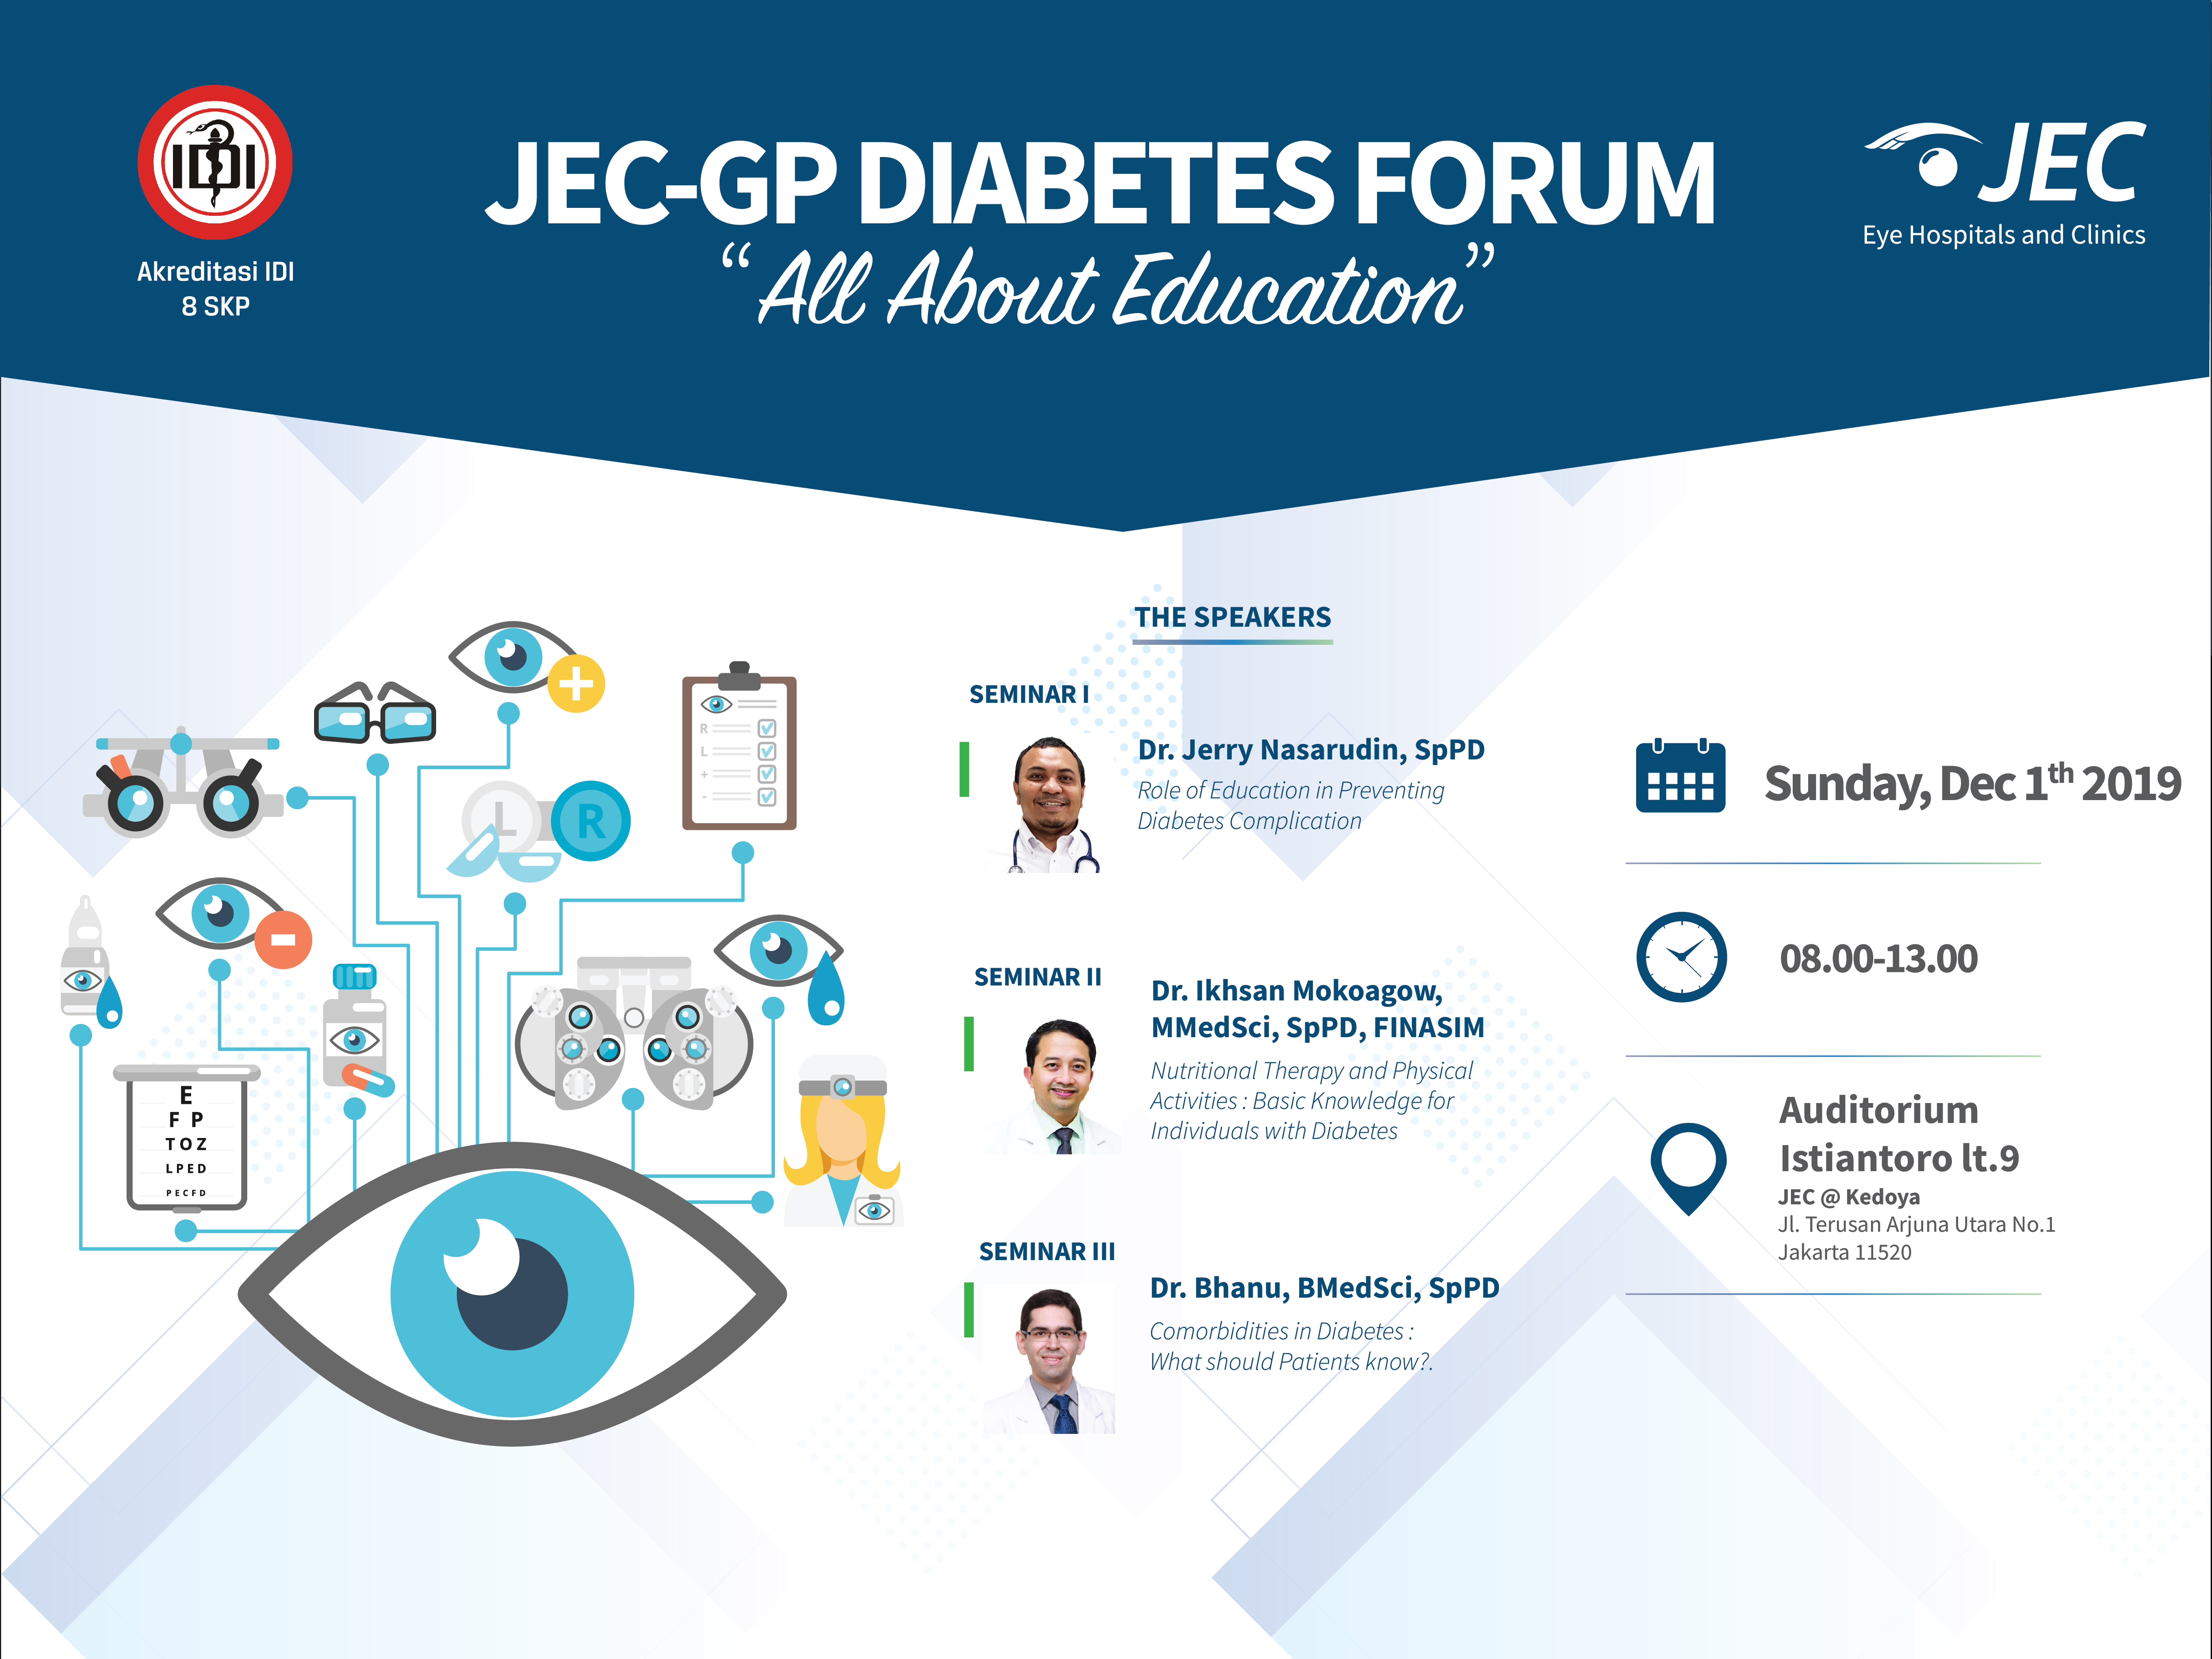 JEC GP Diabetes Forum